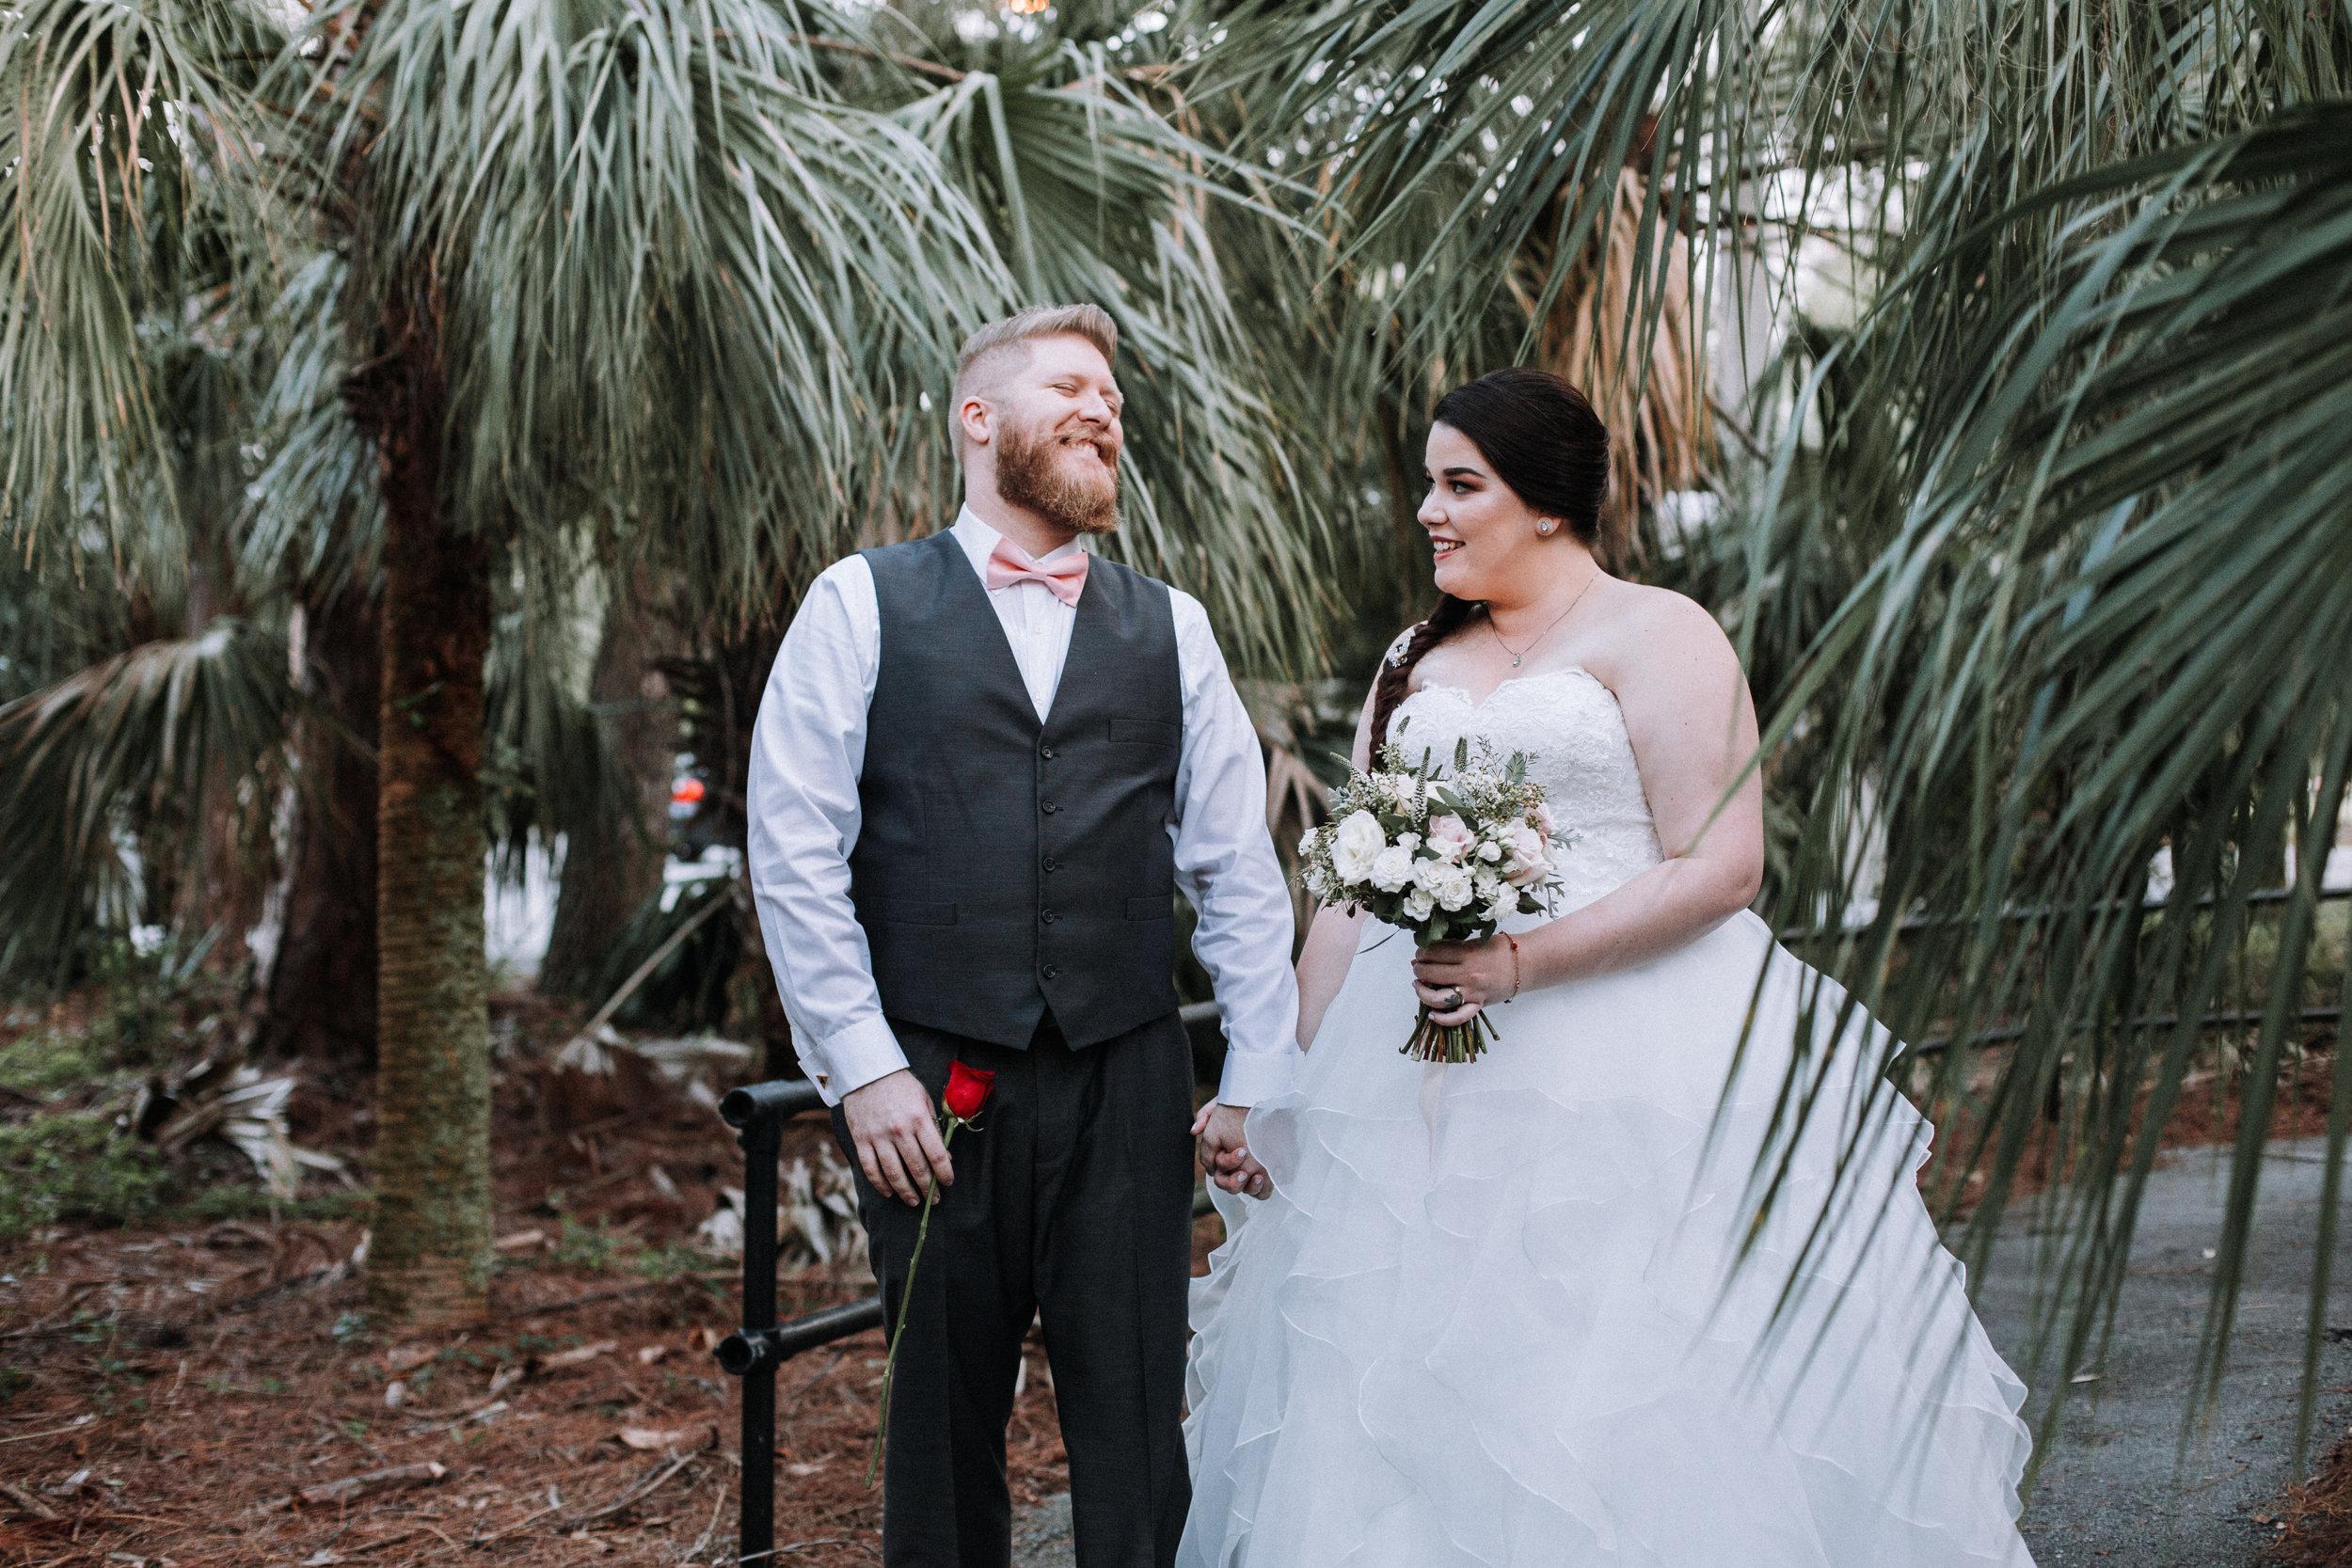 Florida-Wedding-photographer-RKMphotography-111.jpg